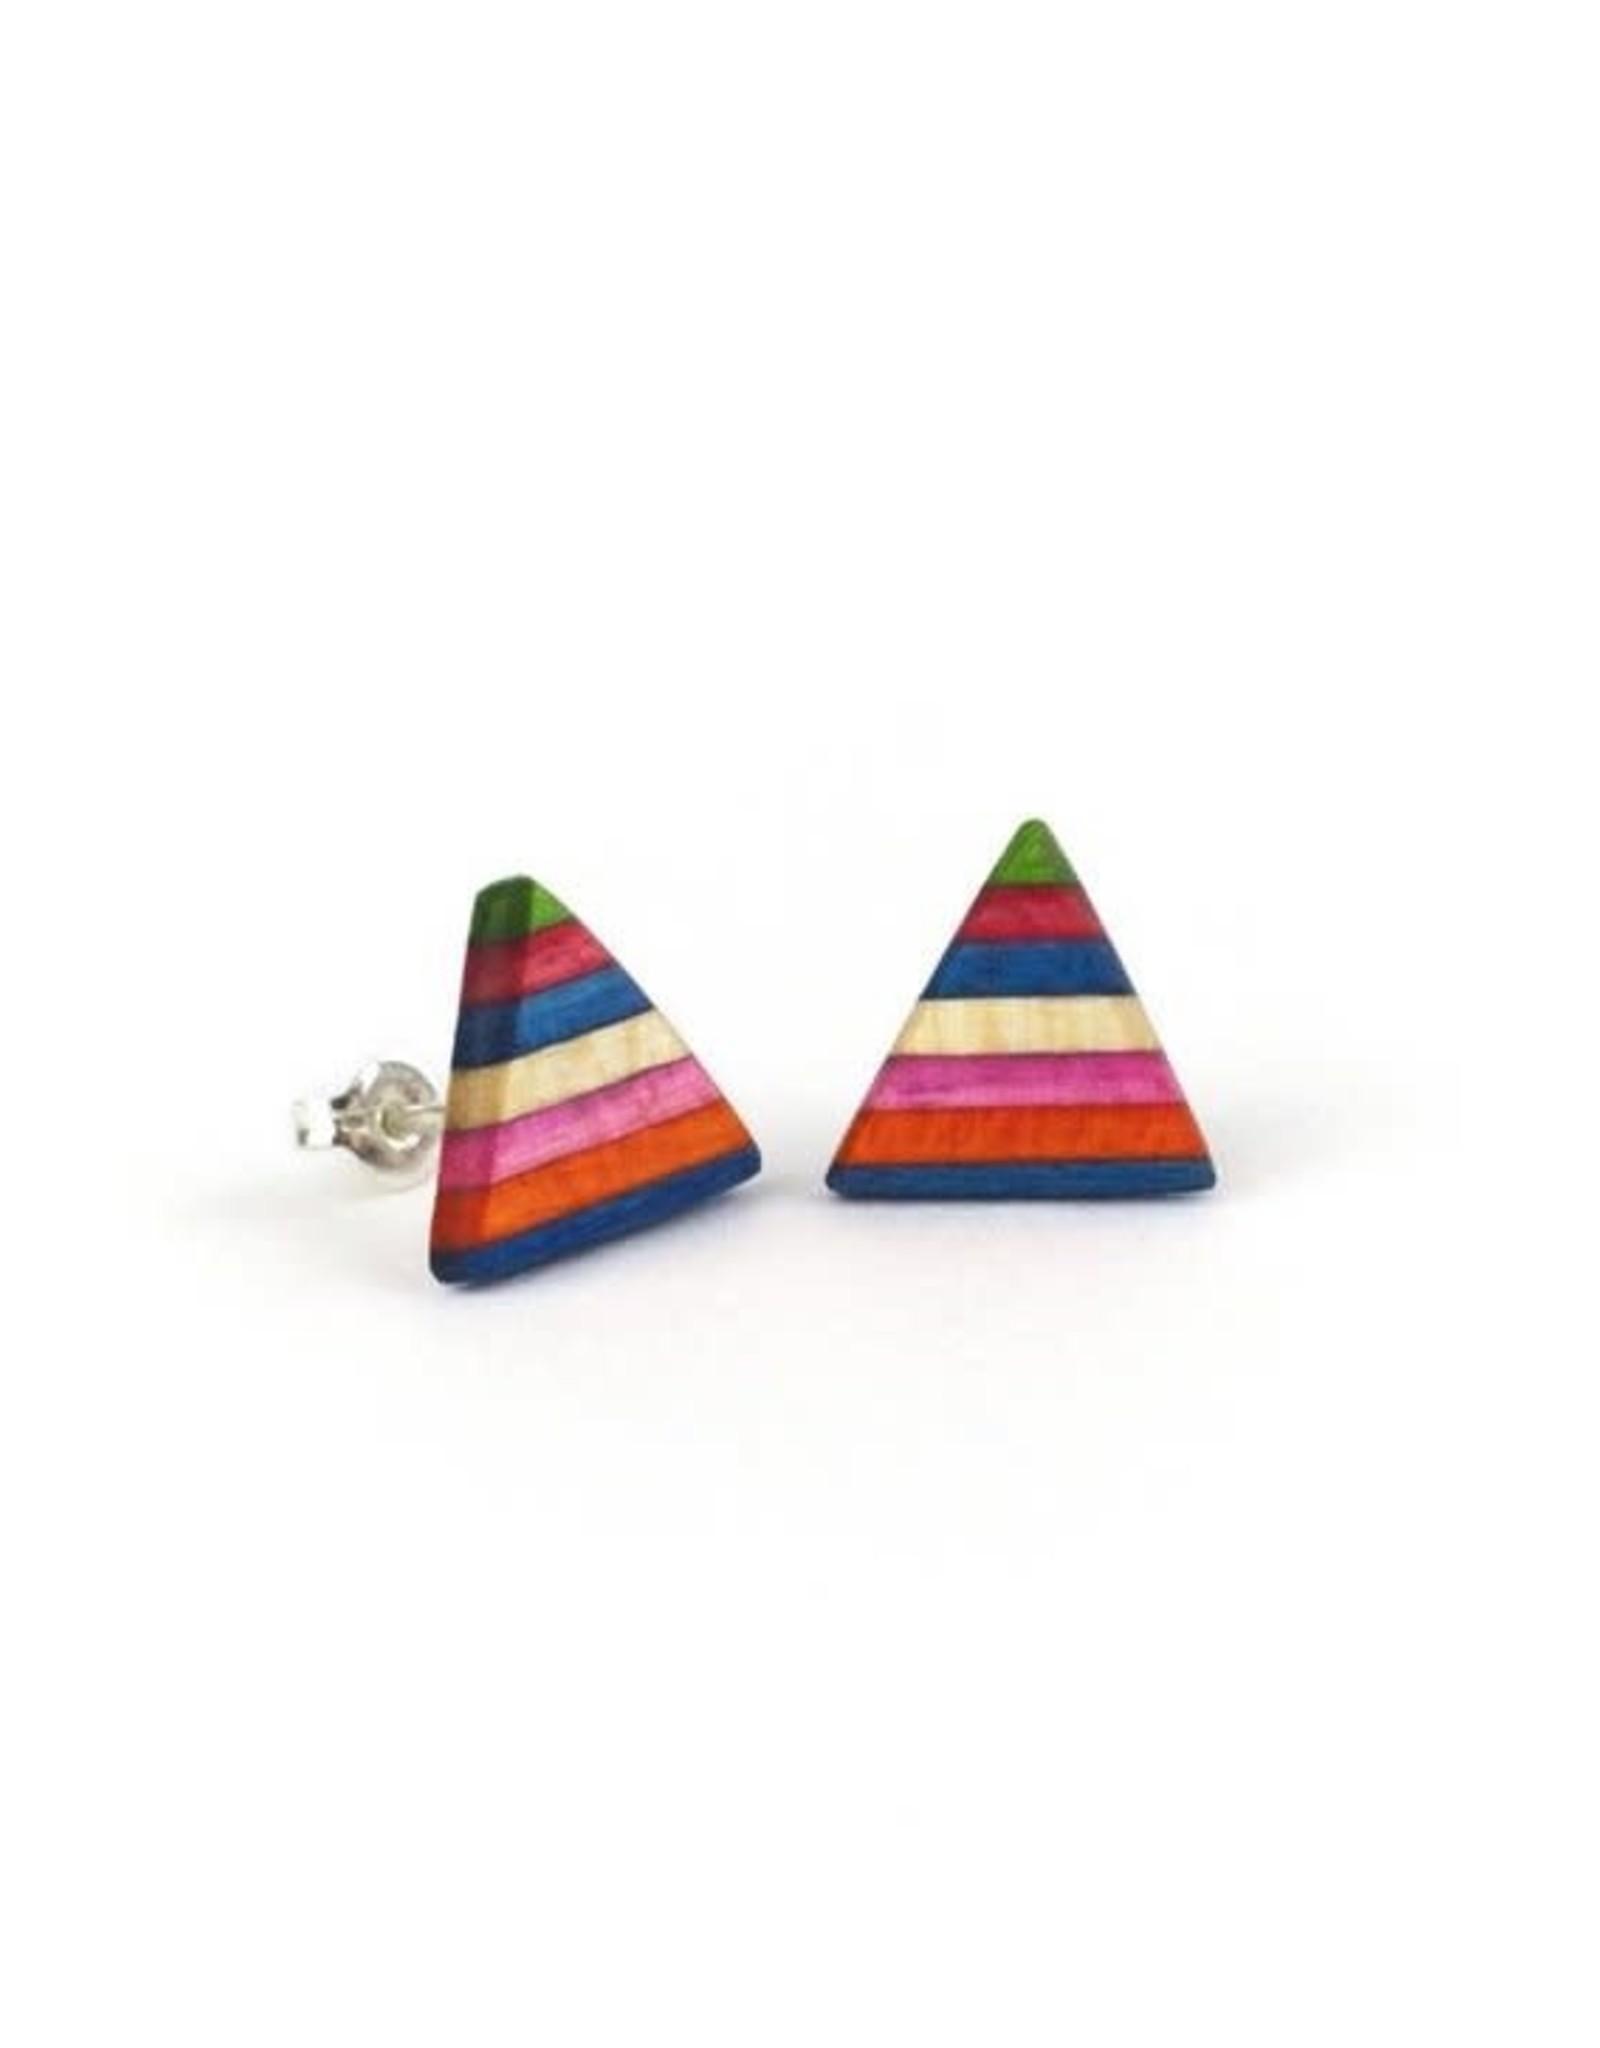 Maple XO Pyramid Stud Earrings - Maple XO